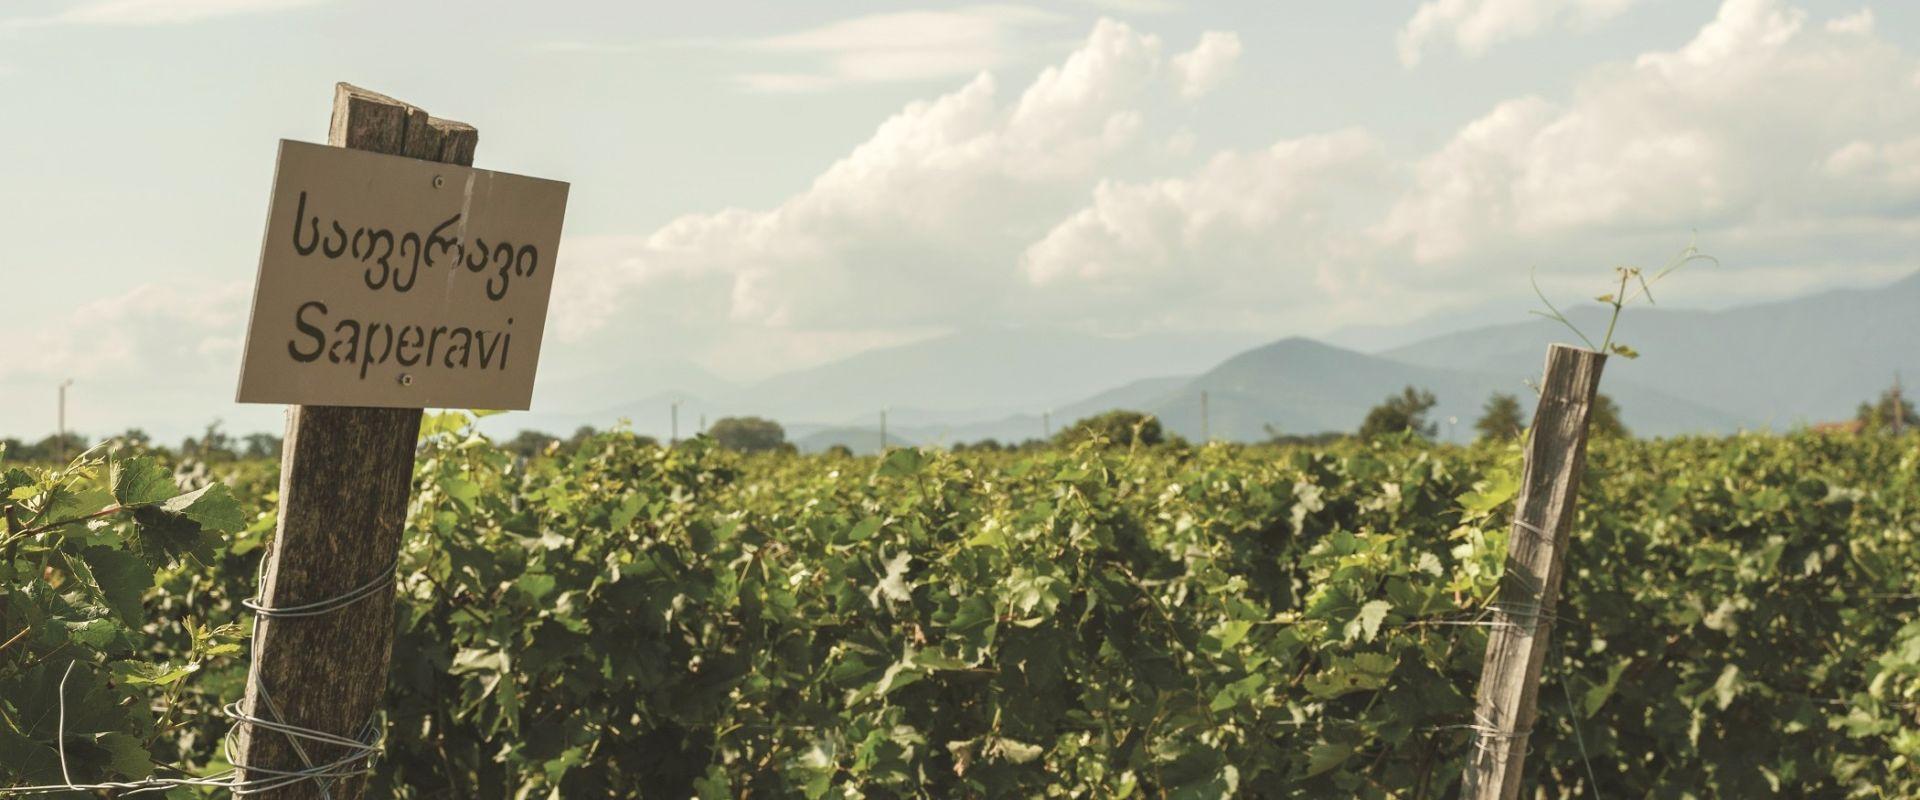 askanelli vineyards in georgia